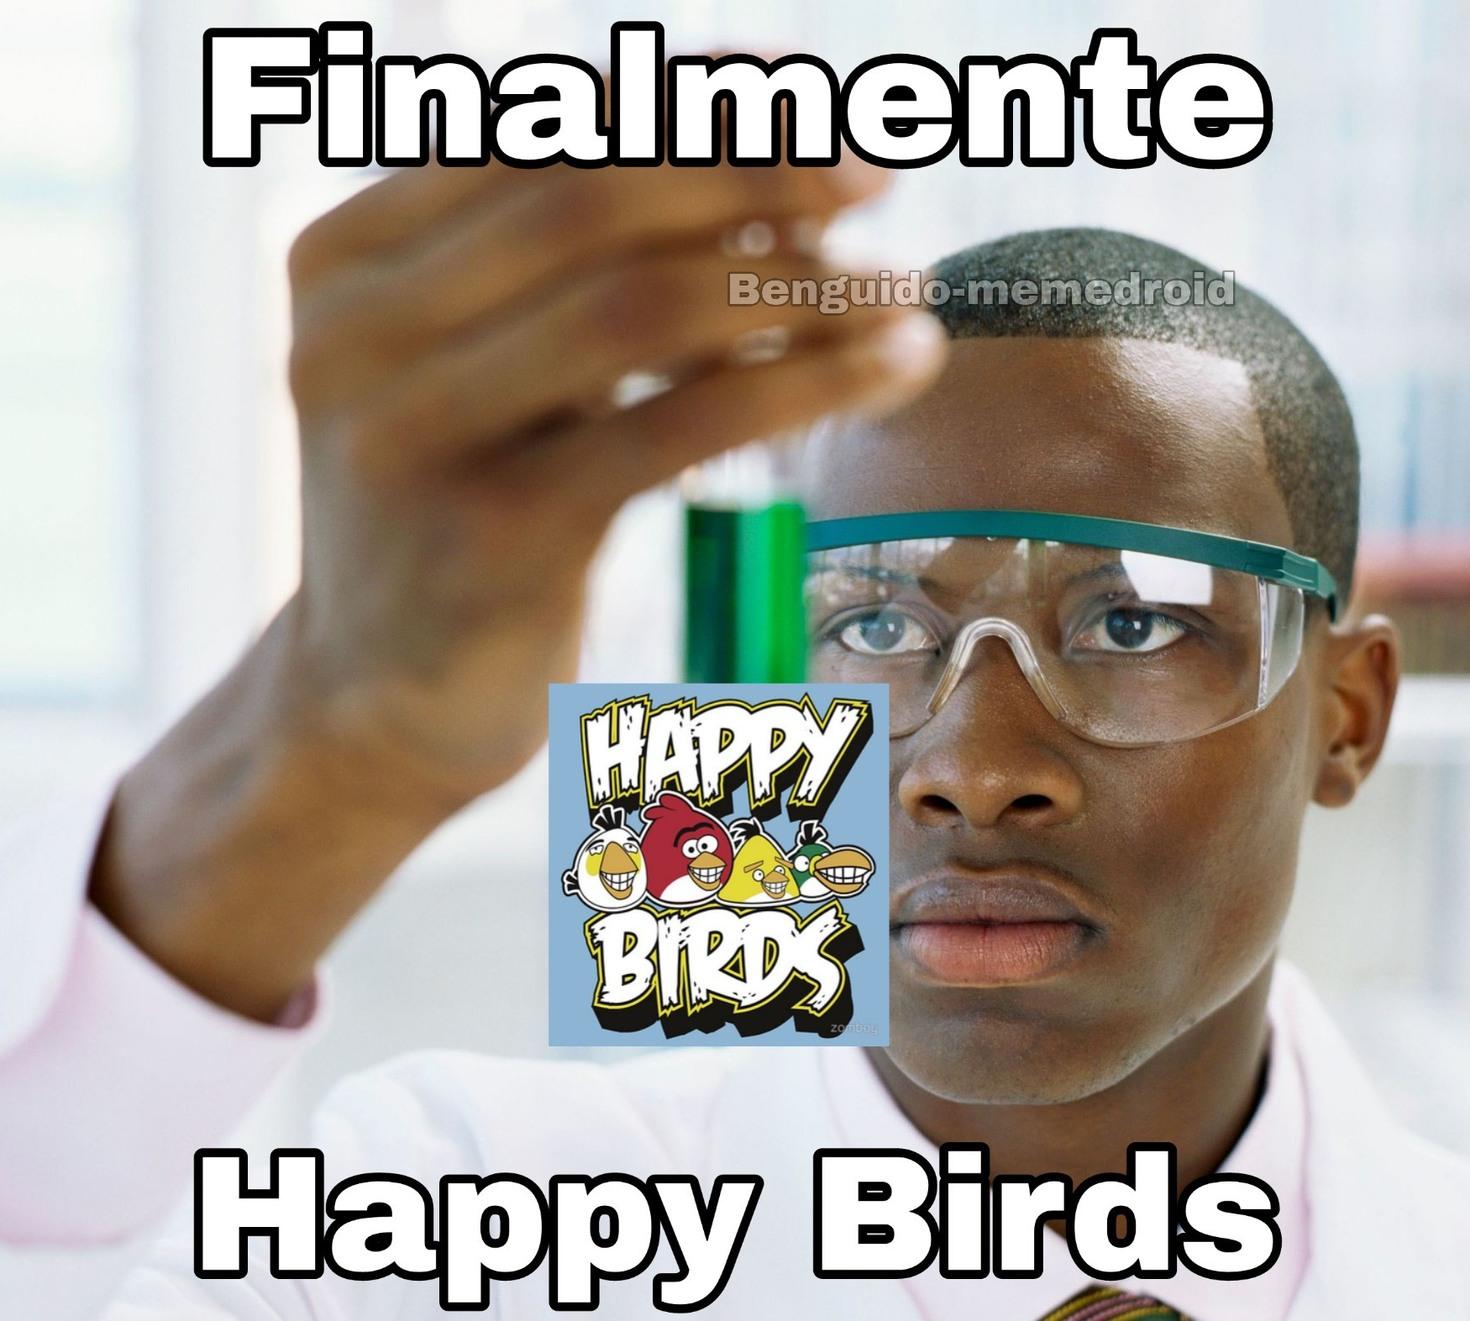 Los jangri birds ahora son japis - meme